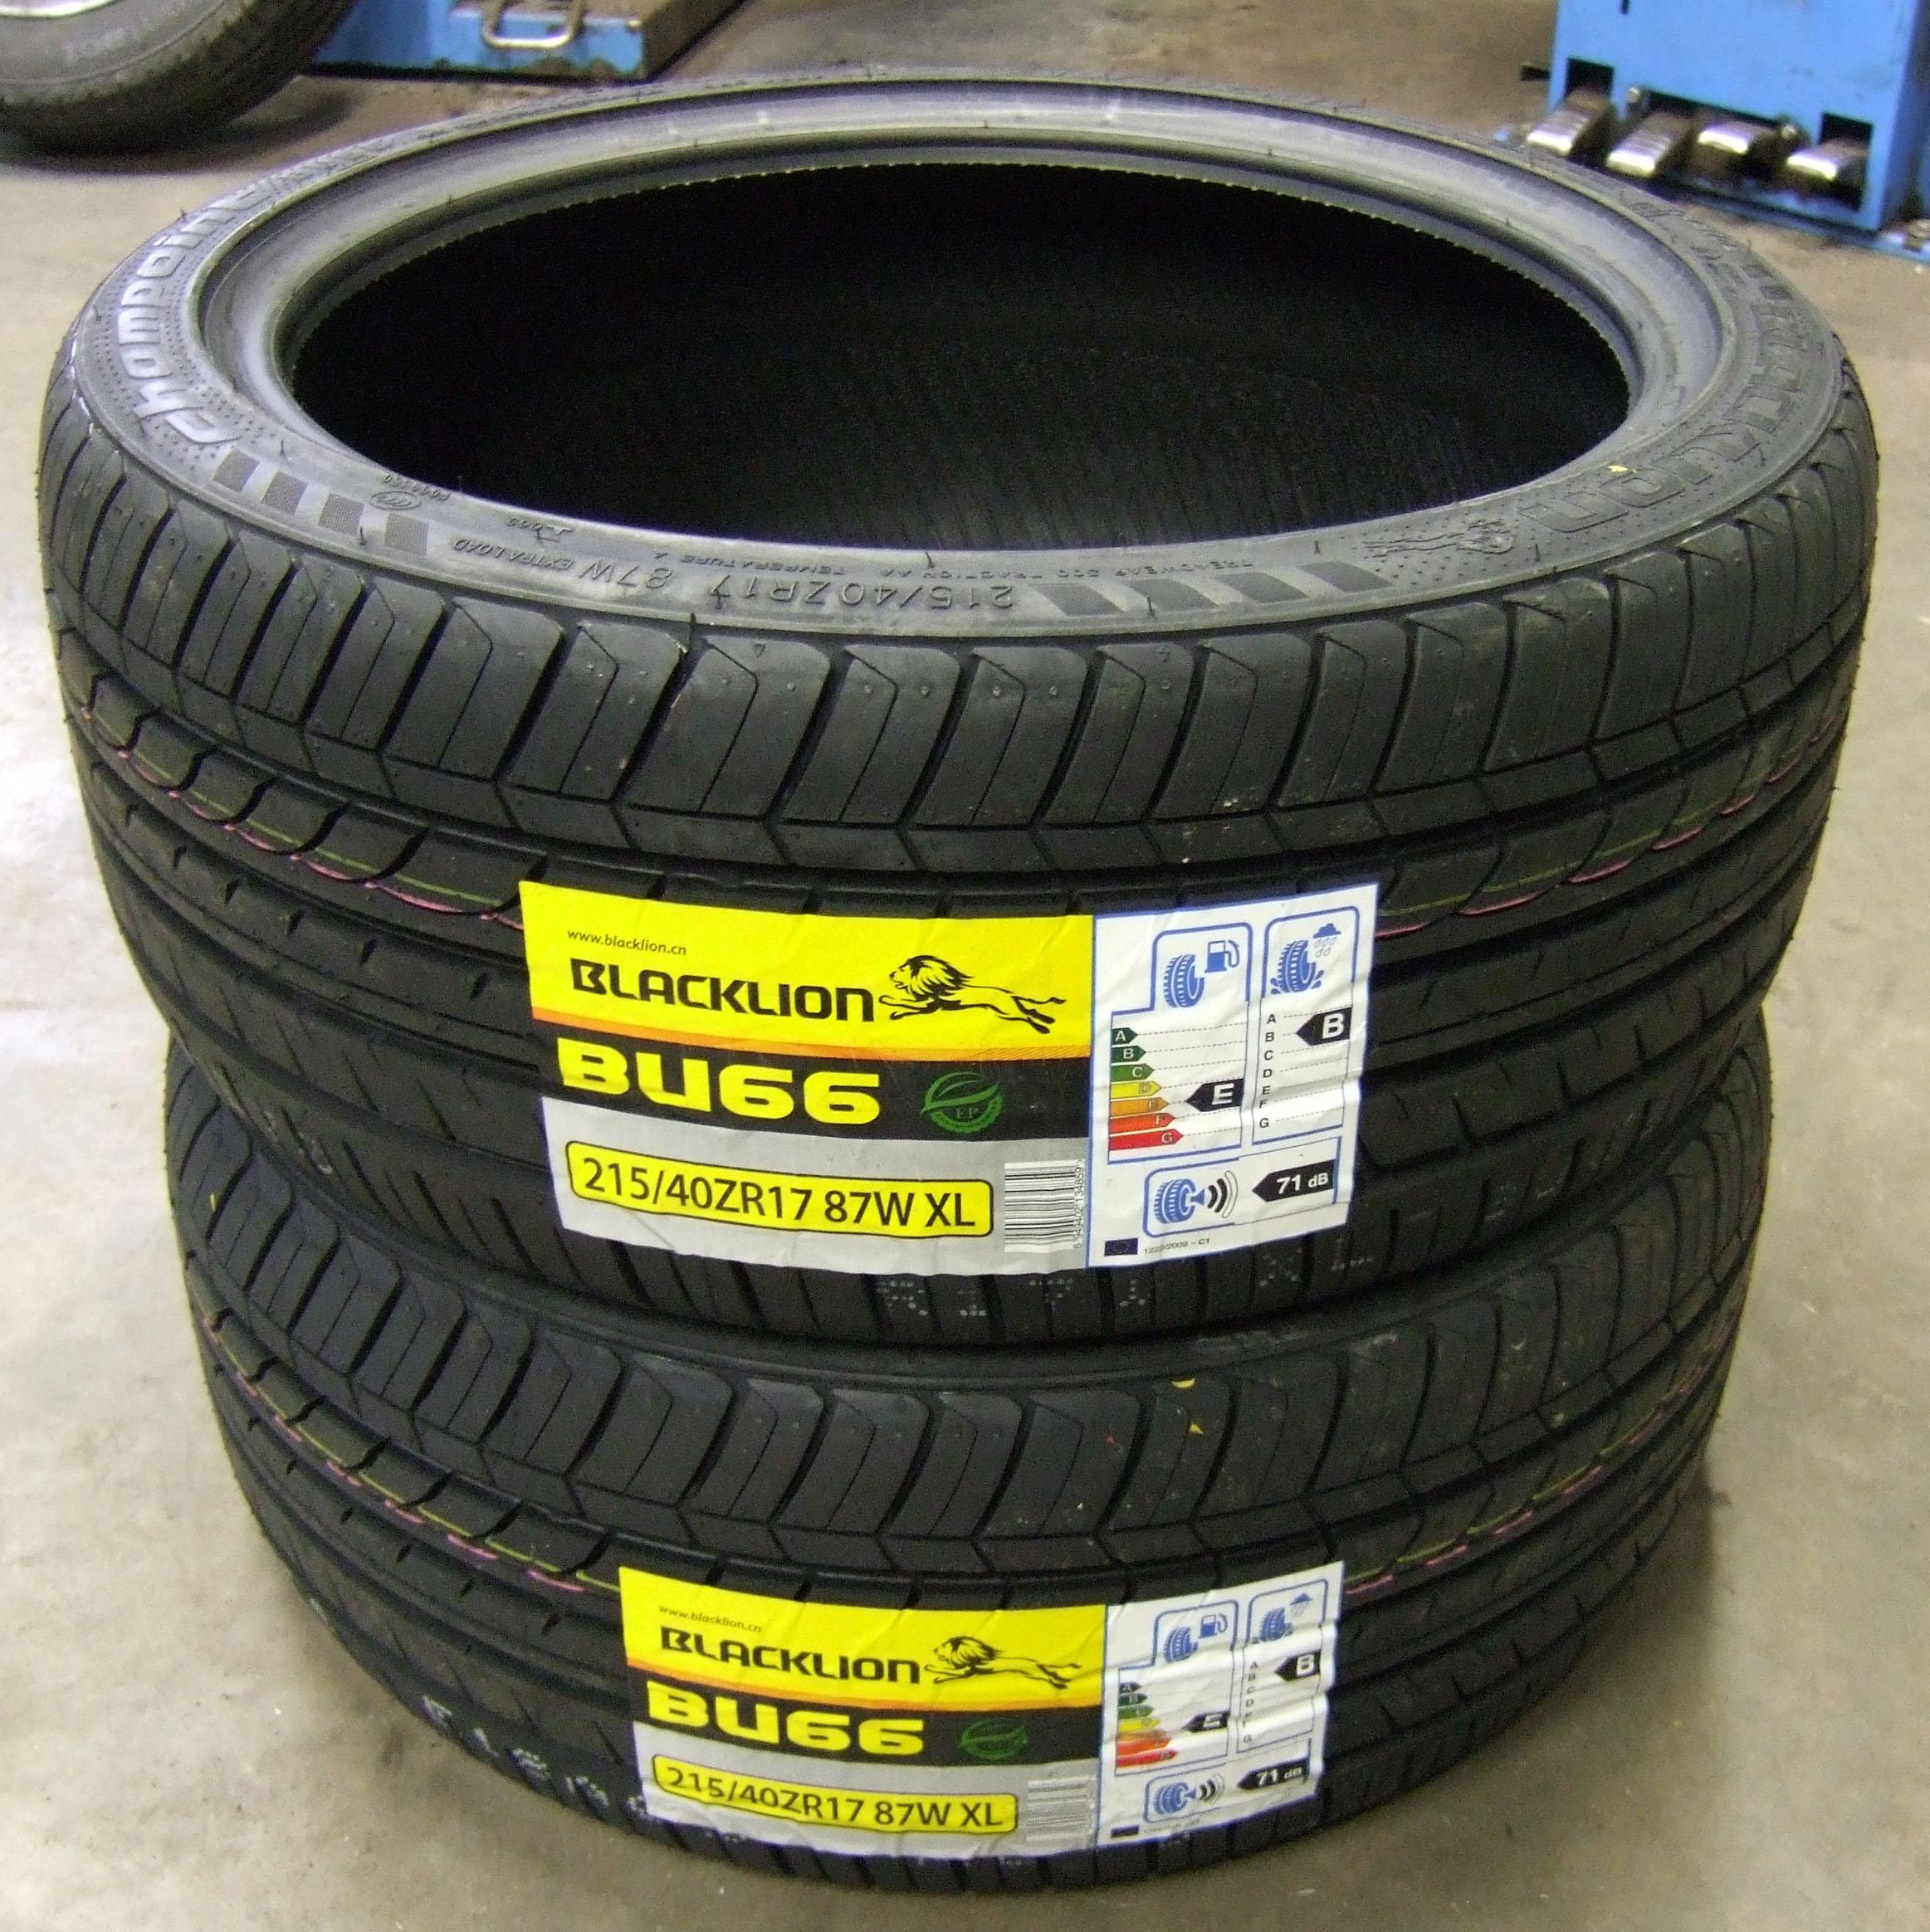 215 40 17 black lion bu66 budget tyre 2154017 87w xl 215. Black Bedroom Furniture Sets. Home Design Ideas